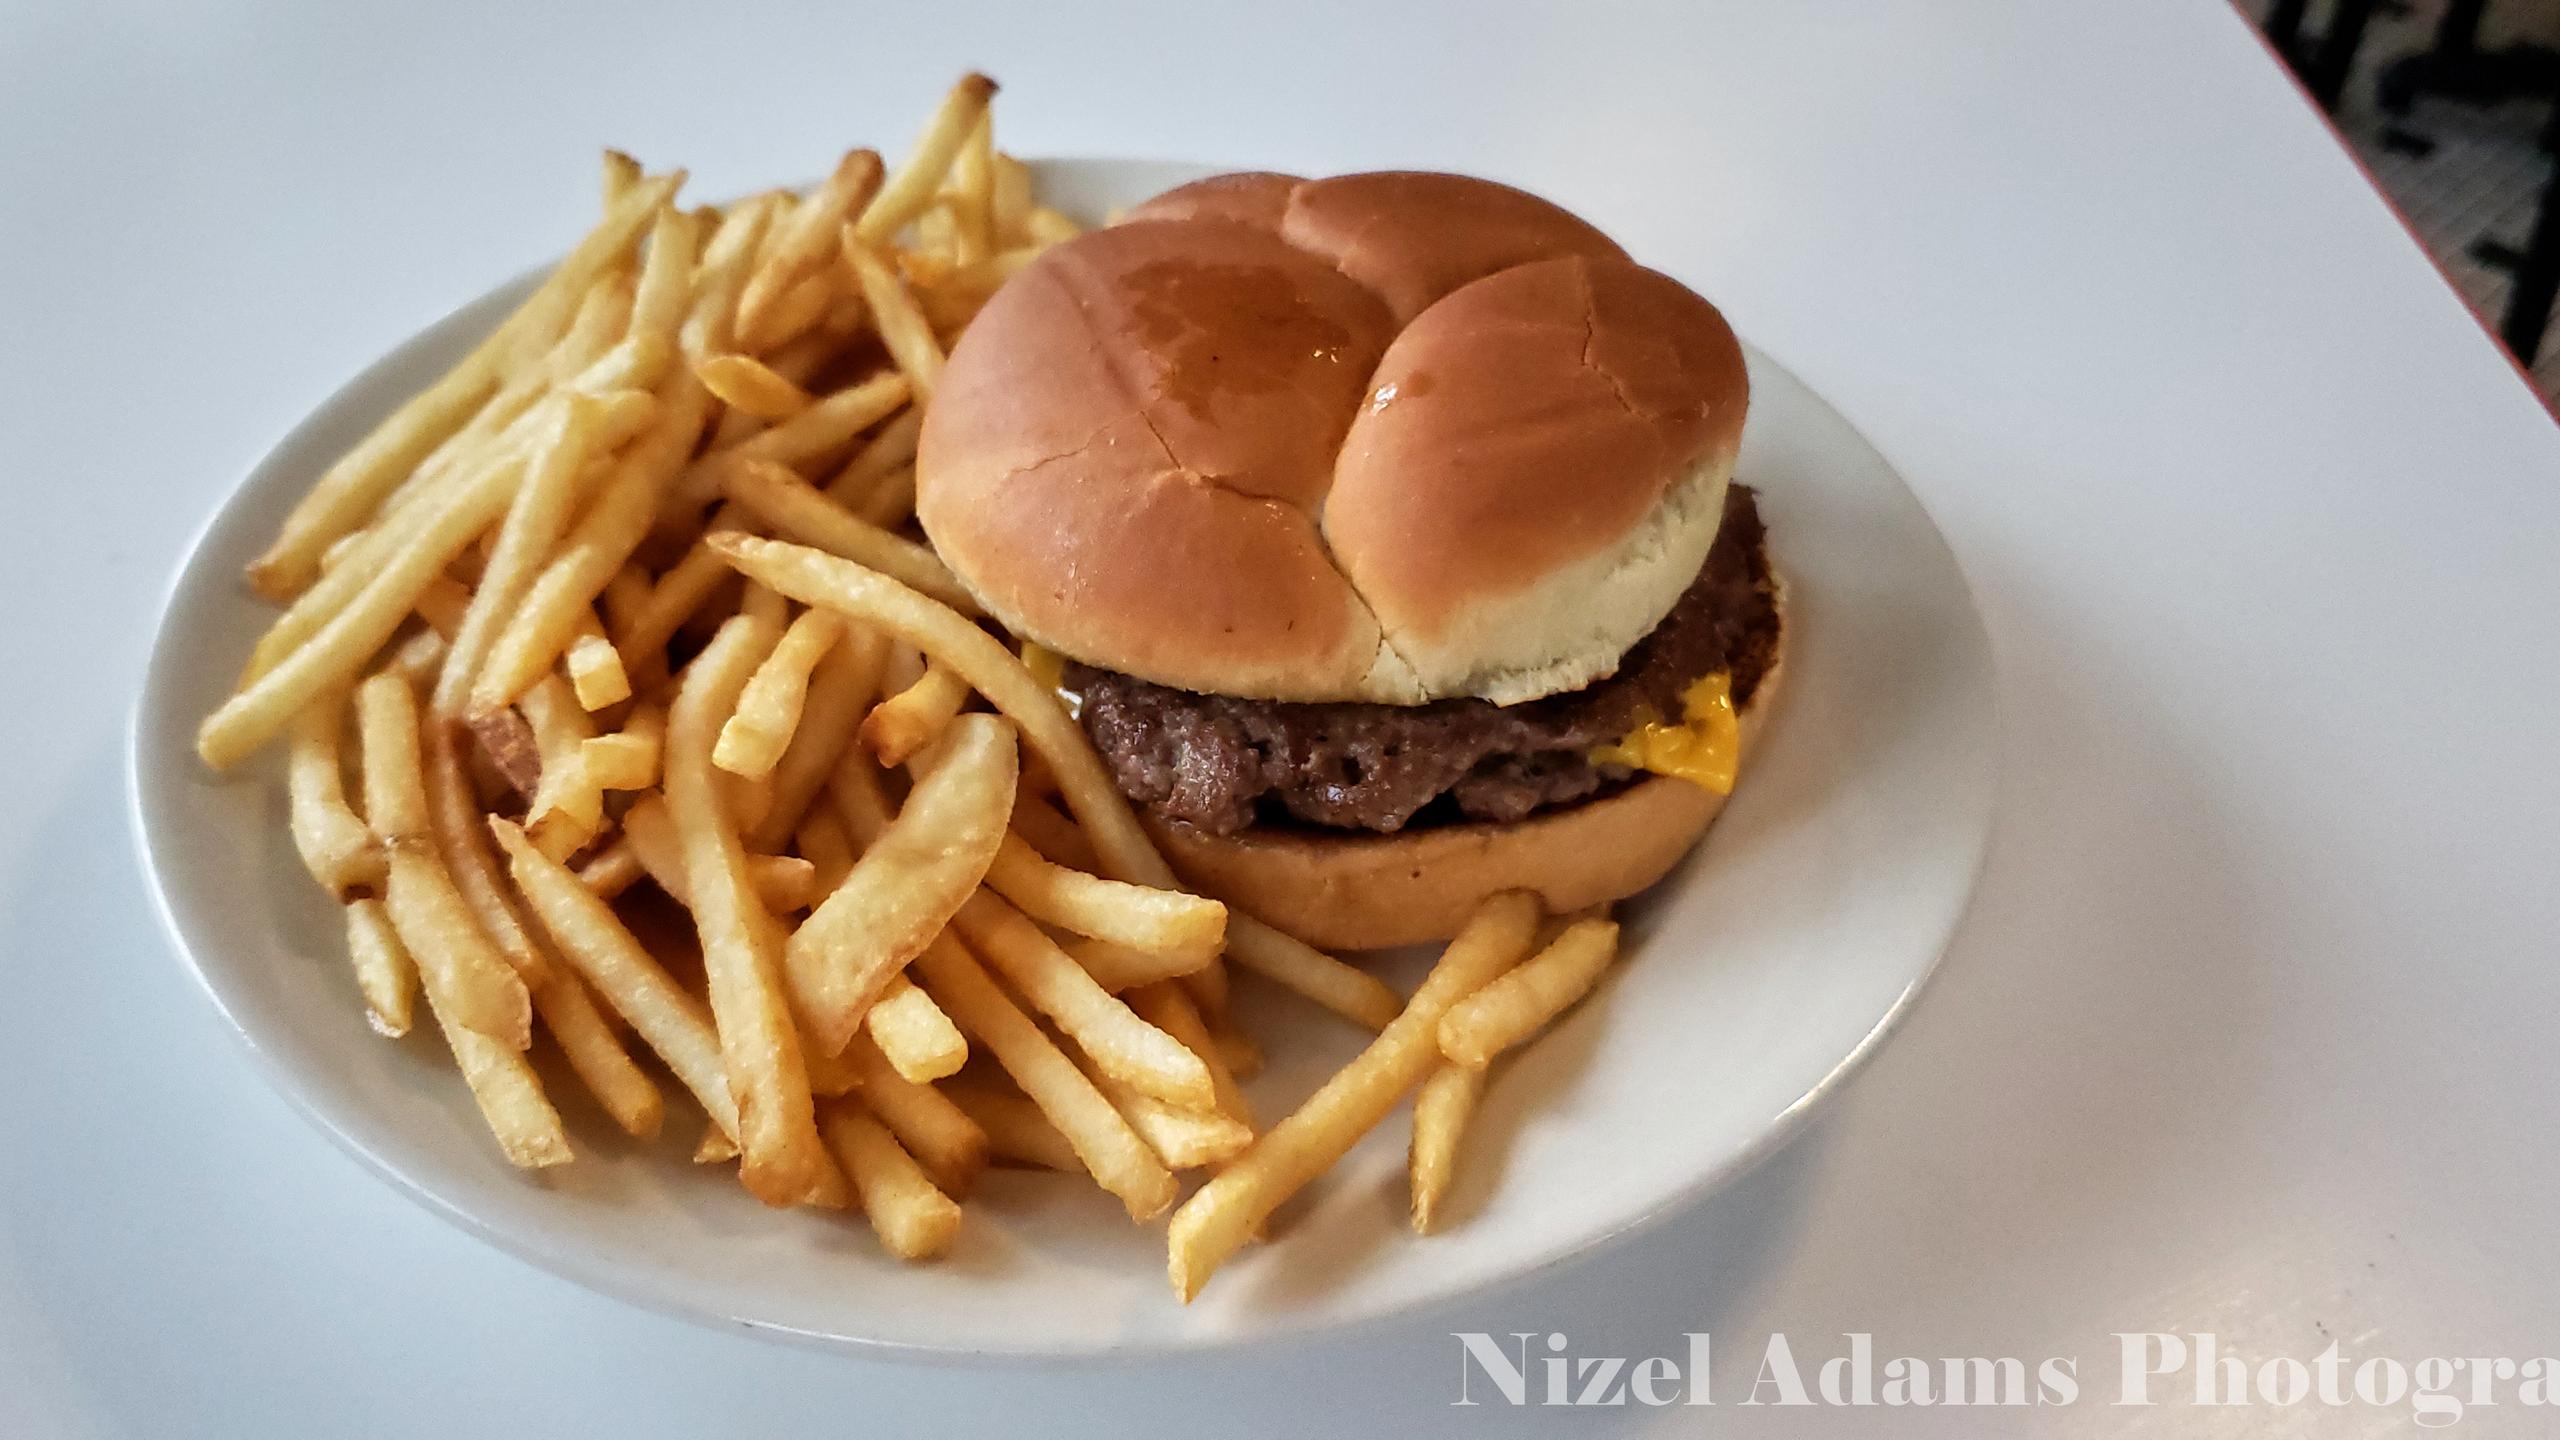 Butter Steakburger (missing grilled onions) at Steak n' Shake Aurora, Illinois